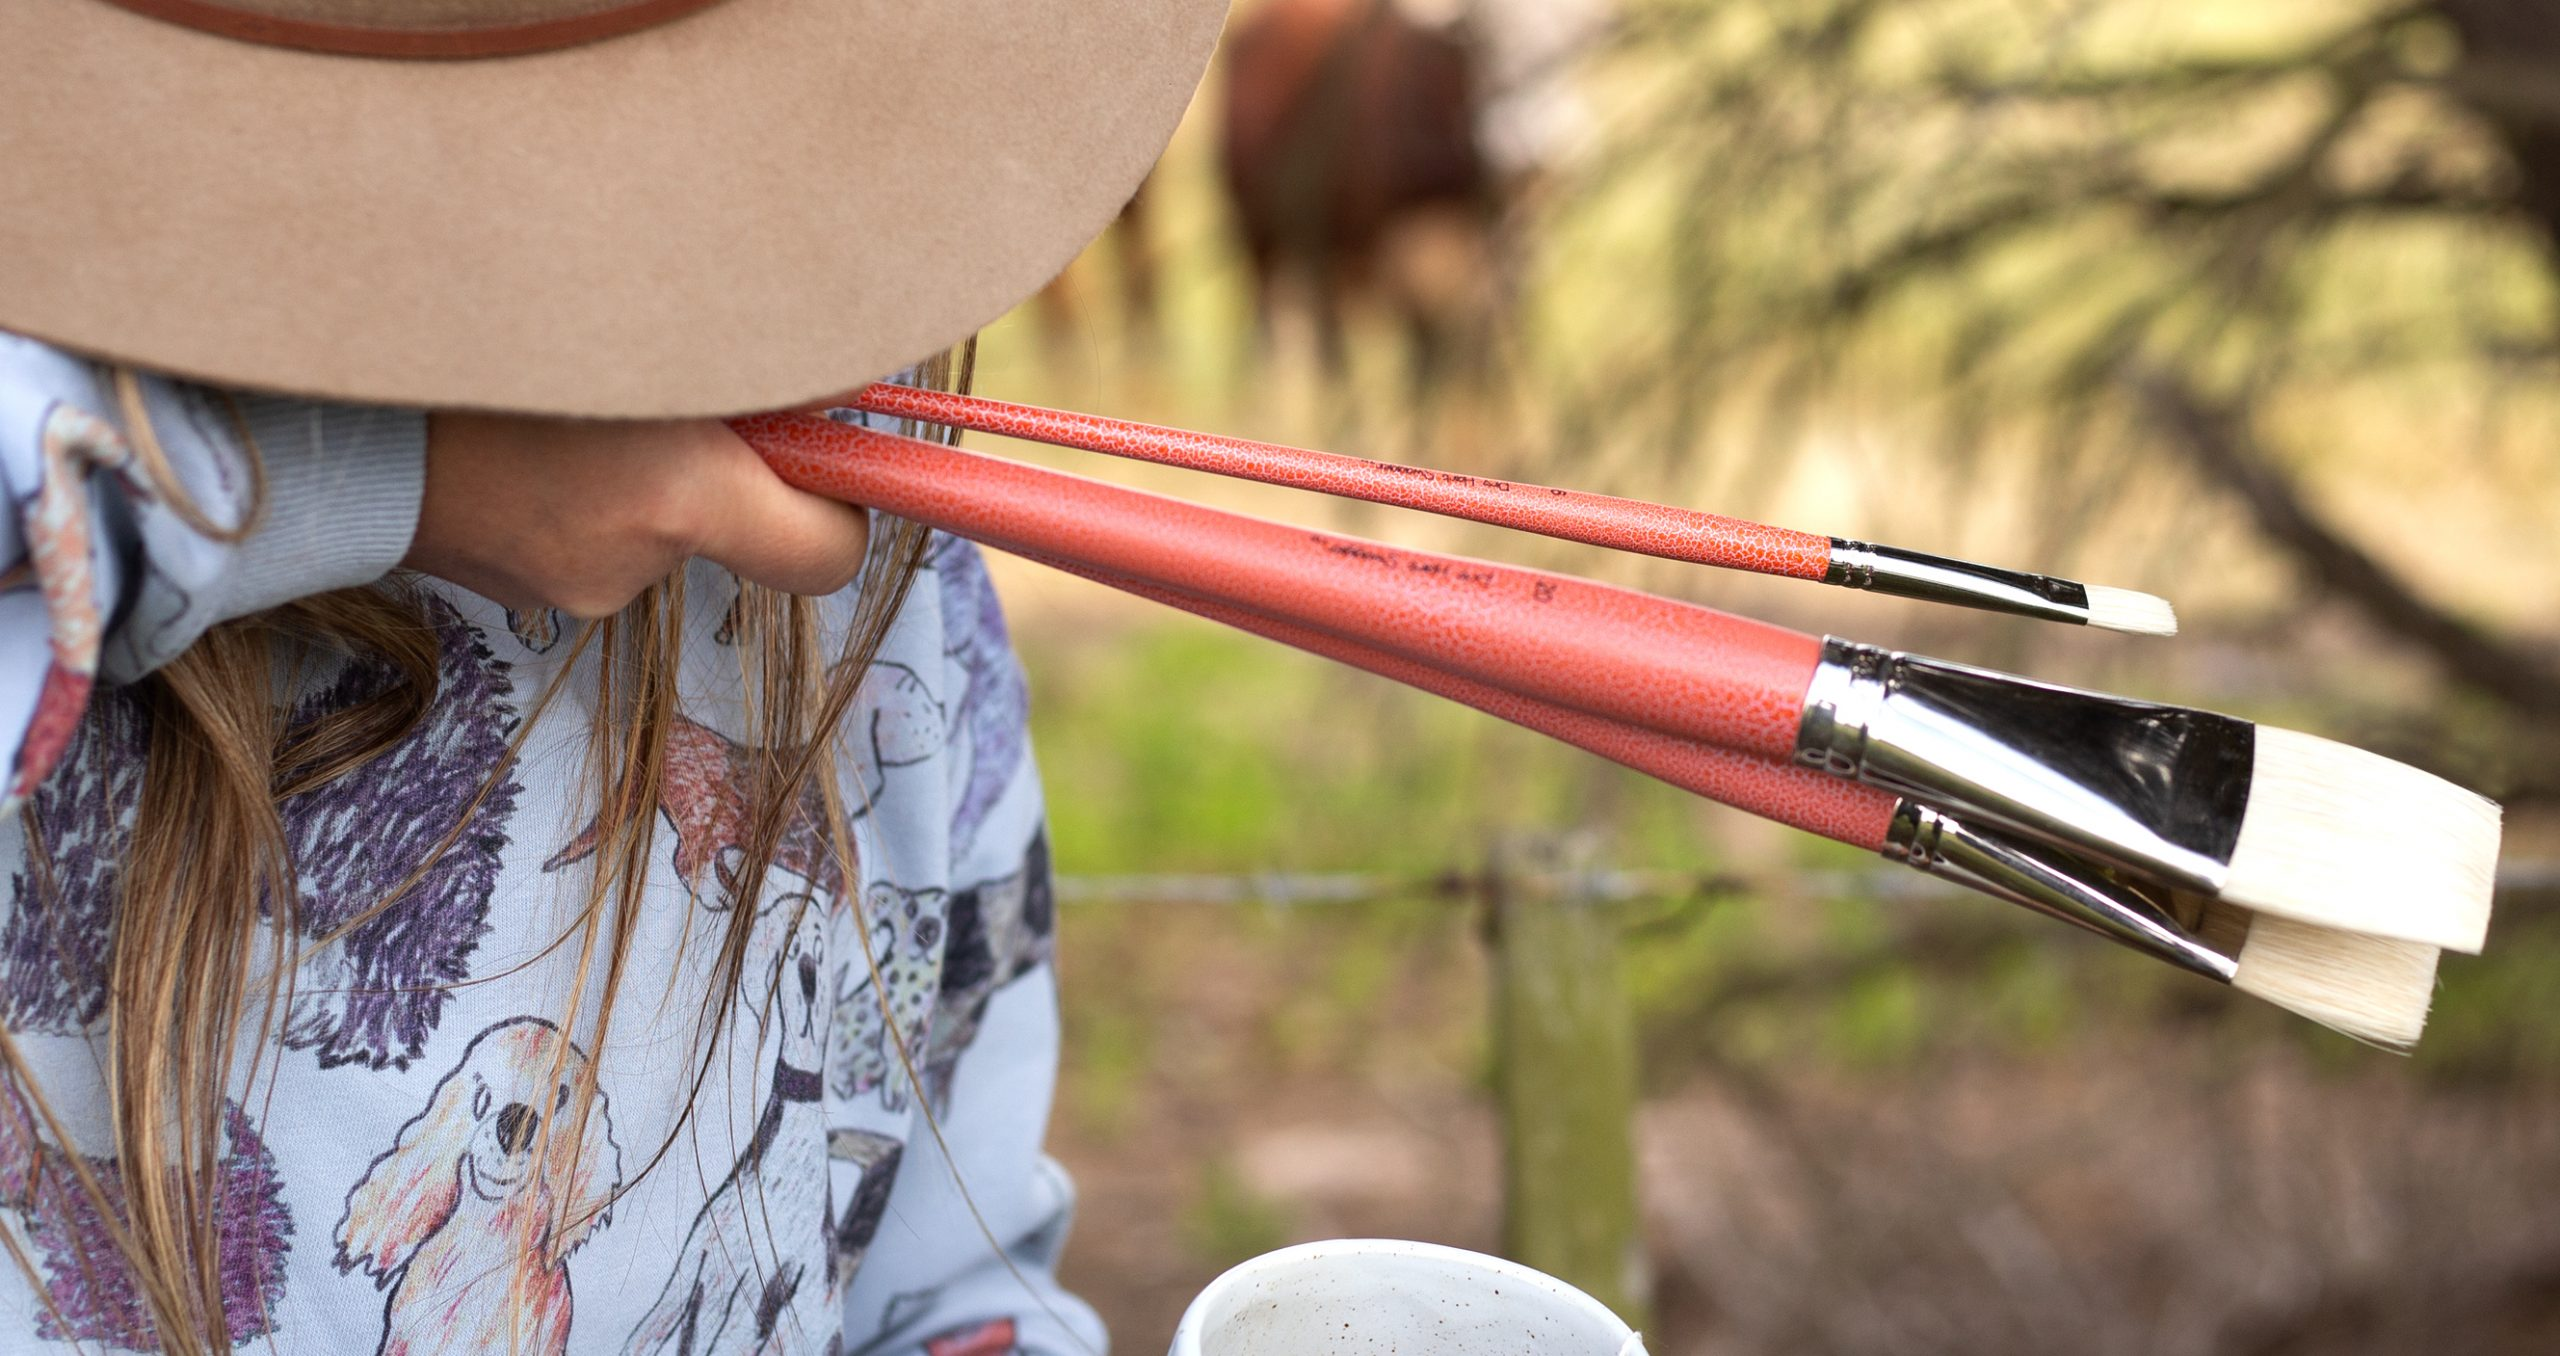 Artist paintbrushes interlocked Hog bristle Pro Hart Swagger